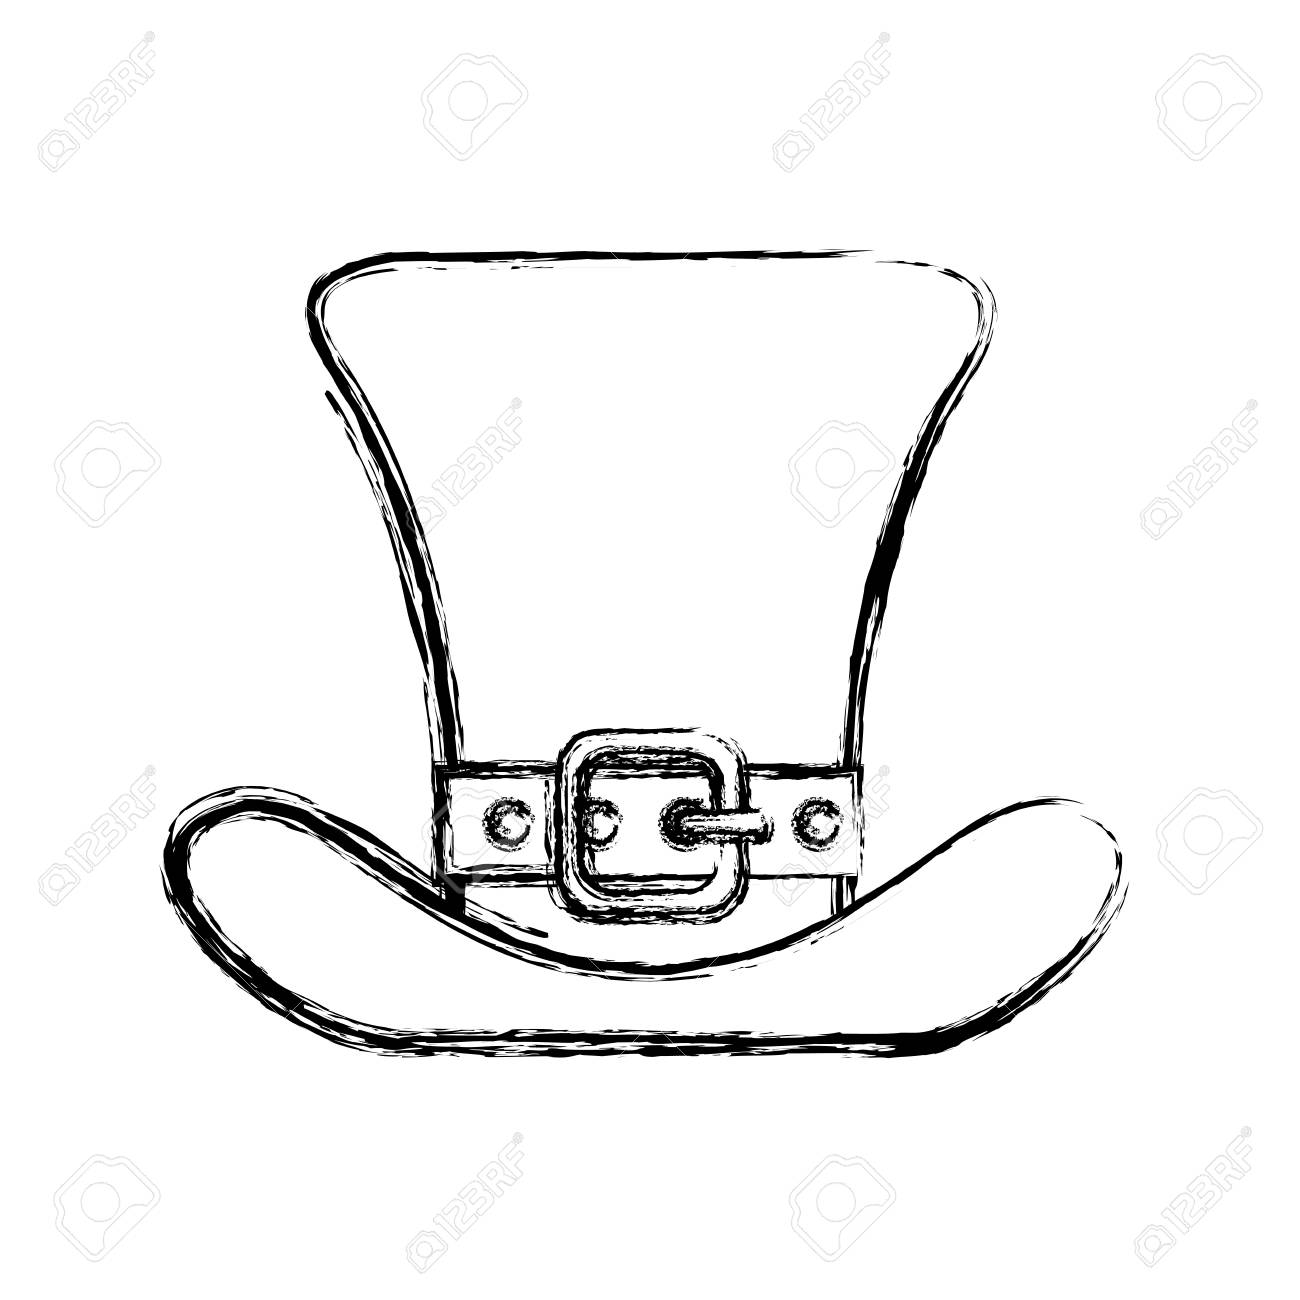 3ba46bedb56 Irish elf hat icon vector illustration graphic design Stock Vector -  76681489